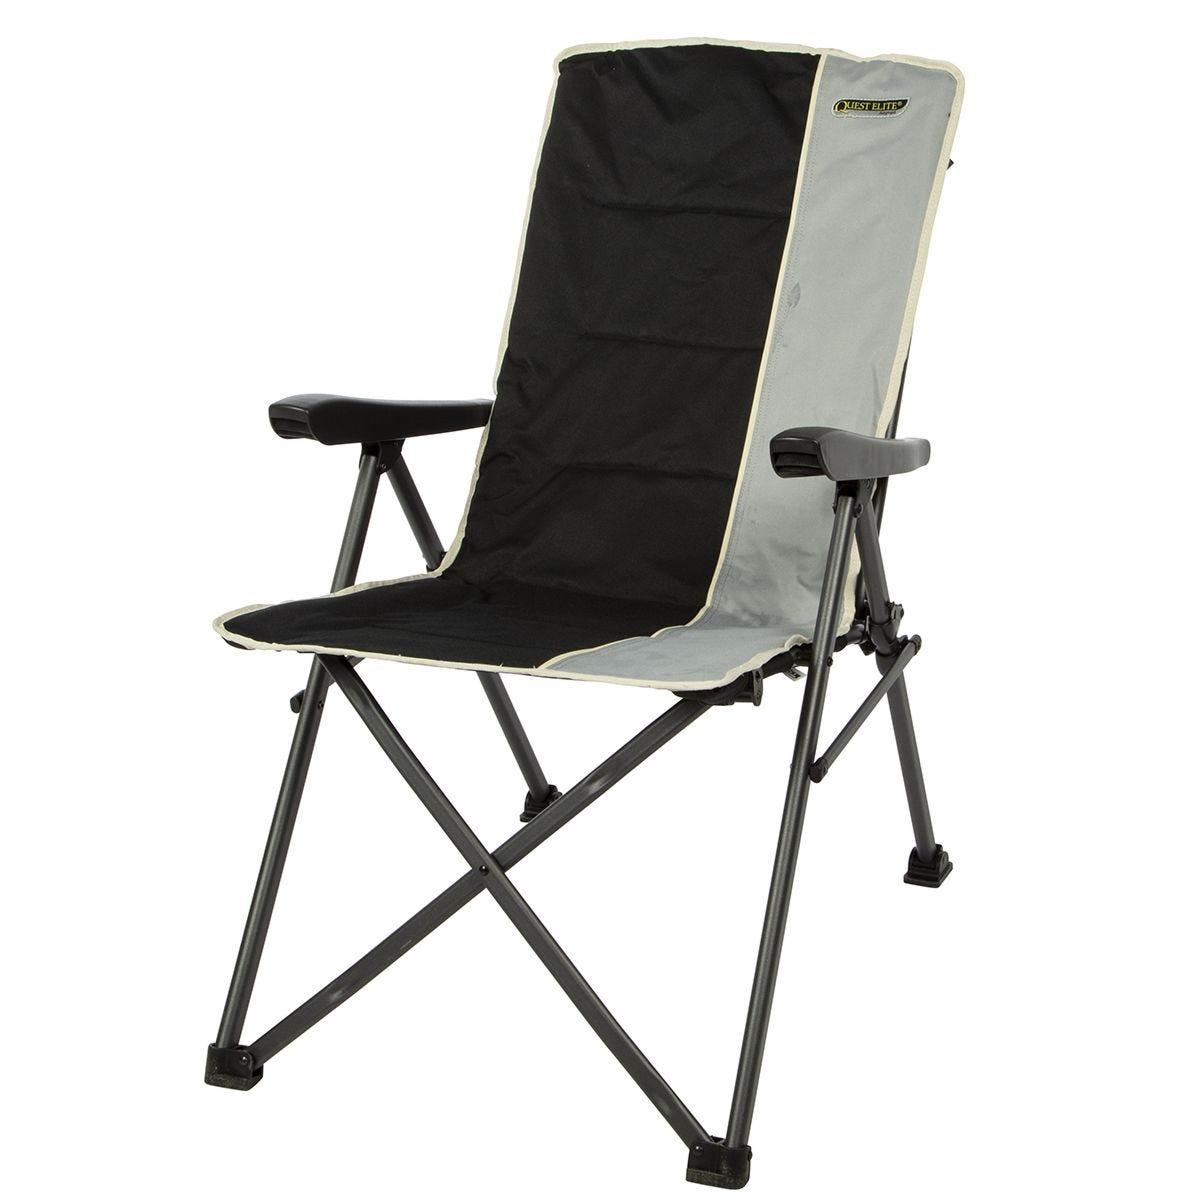 Quest Cumbria Chair - Black/Grey